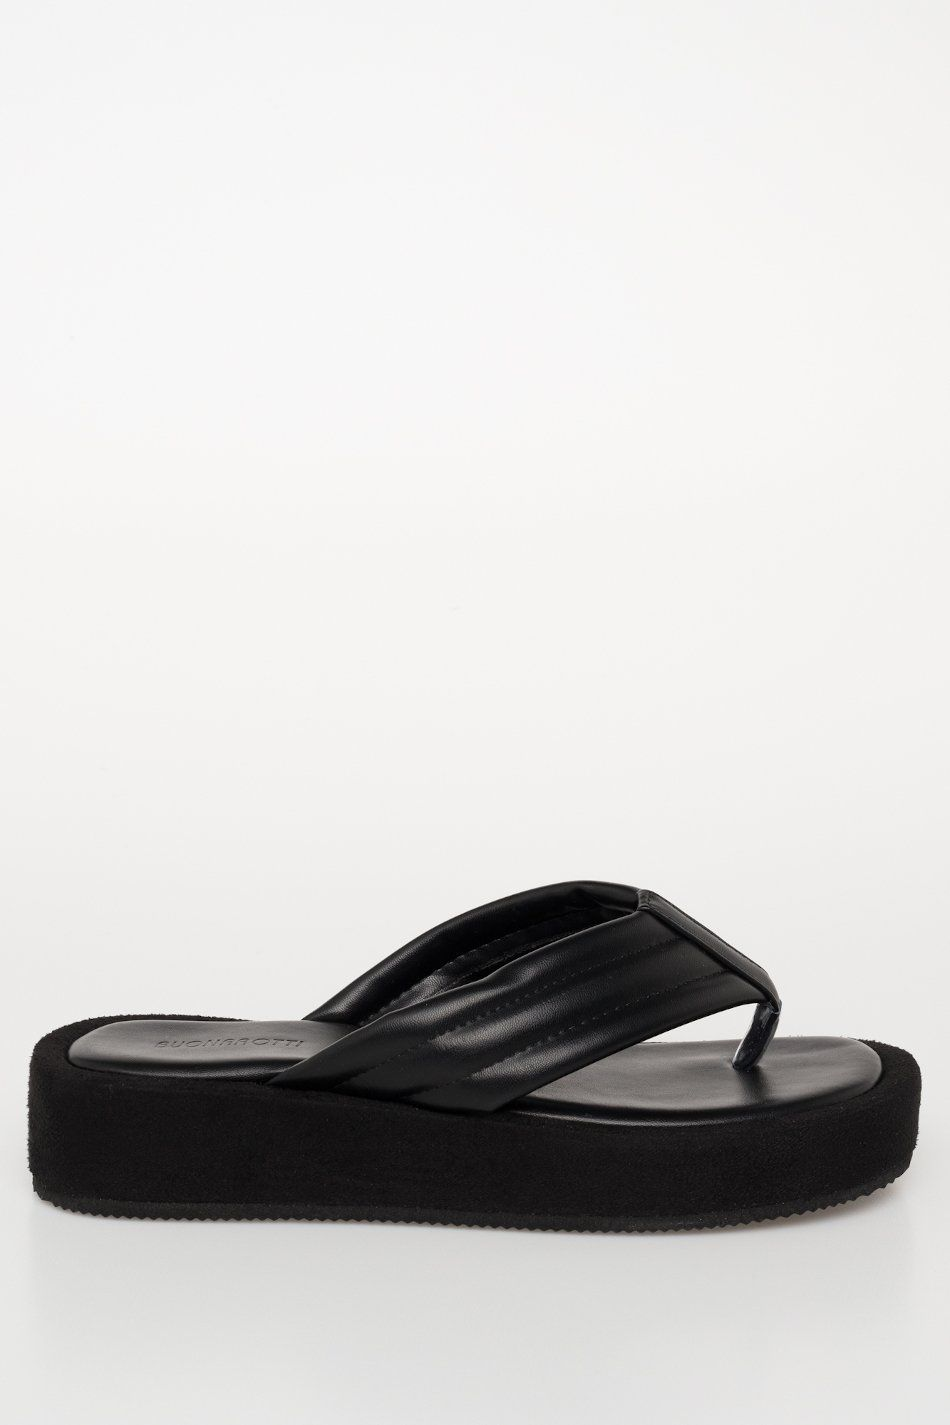 Sandalia flatform dedo acolchada líneas negro